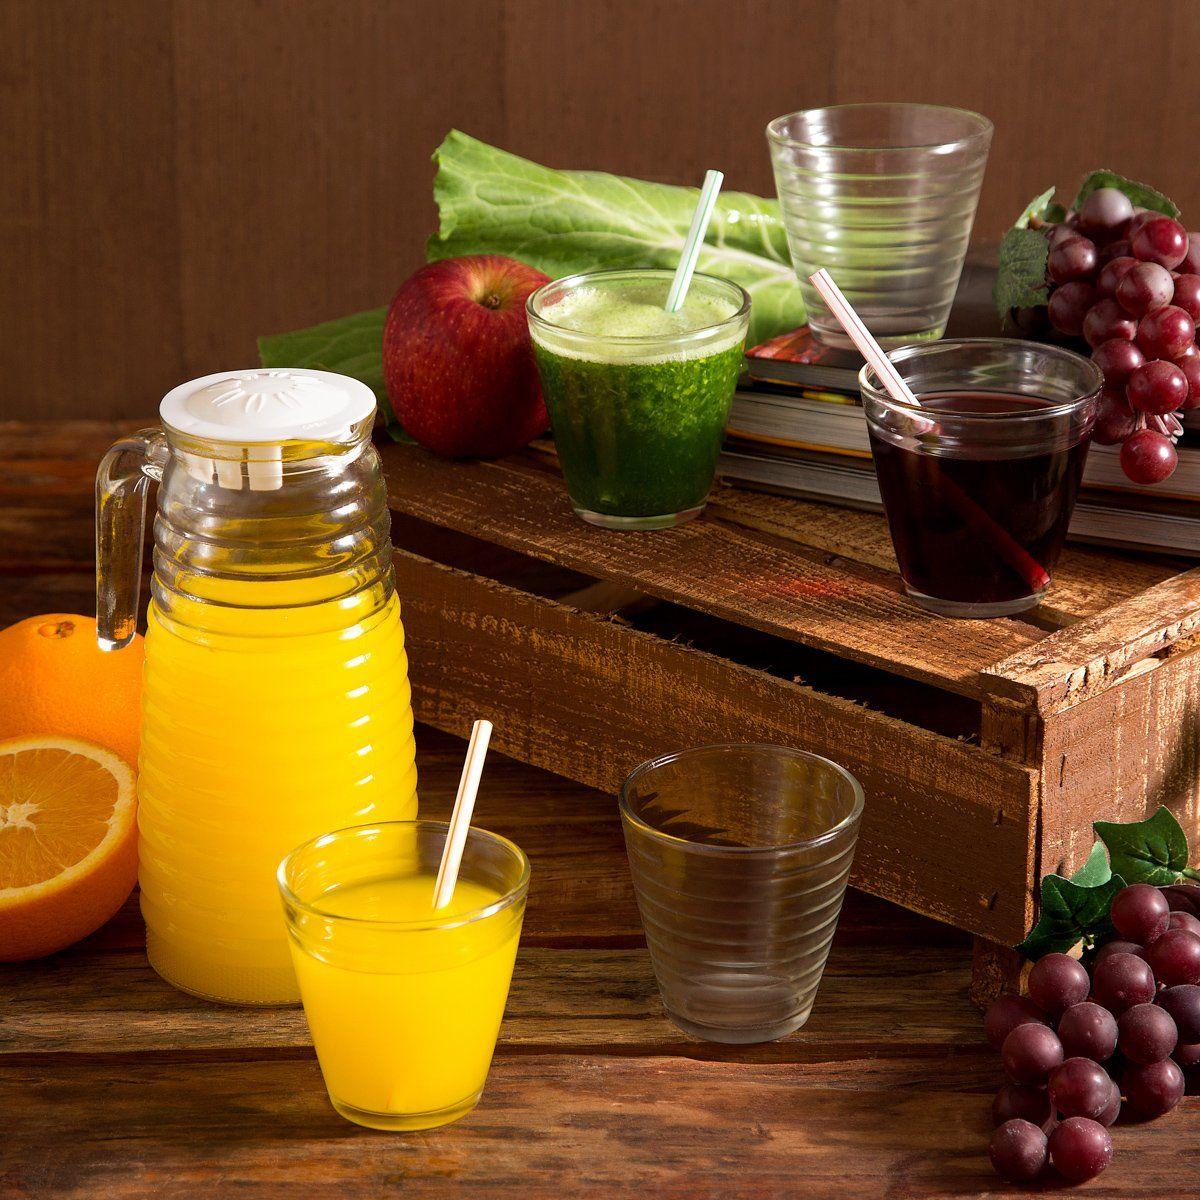 Conjunto Jarra 1,1 litros + 6 copos 250ml de vidro transparente Colméia Lyor - L6722